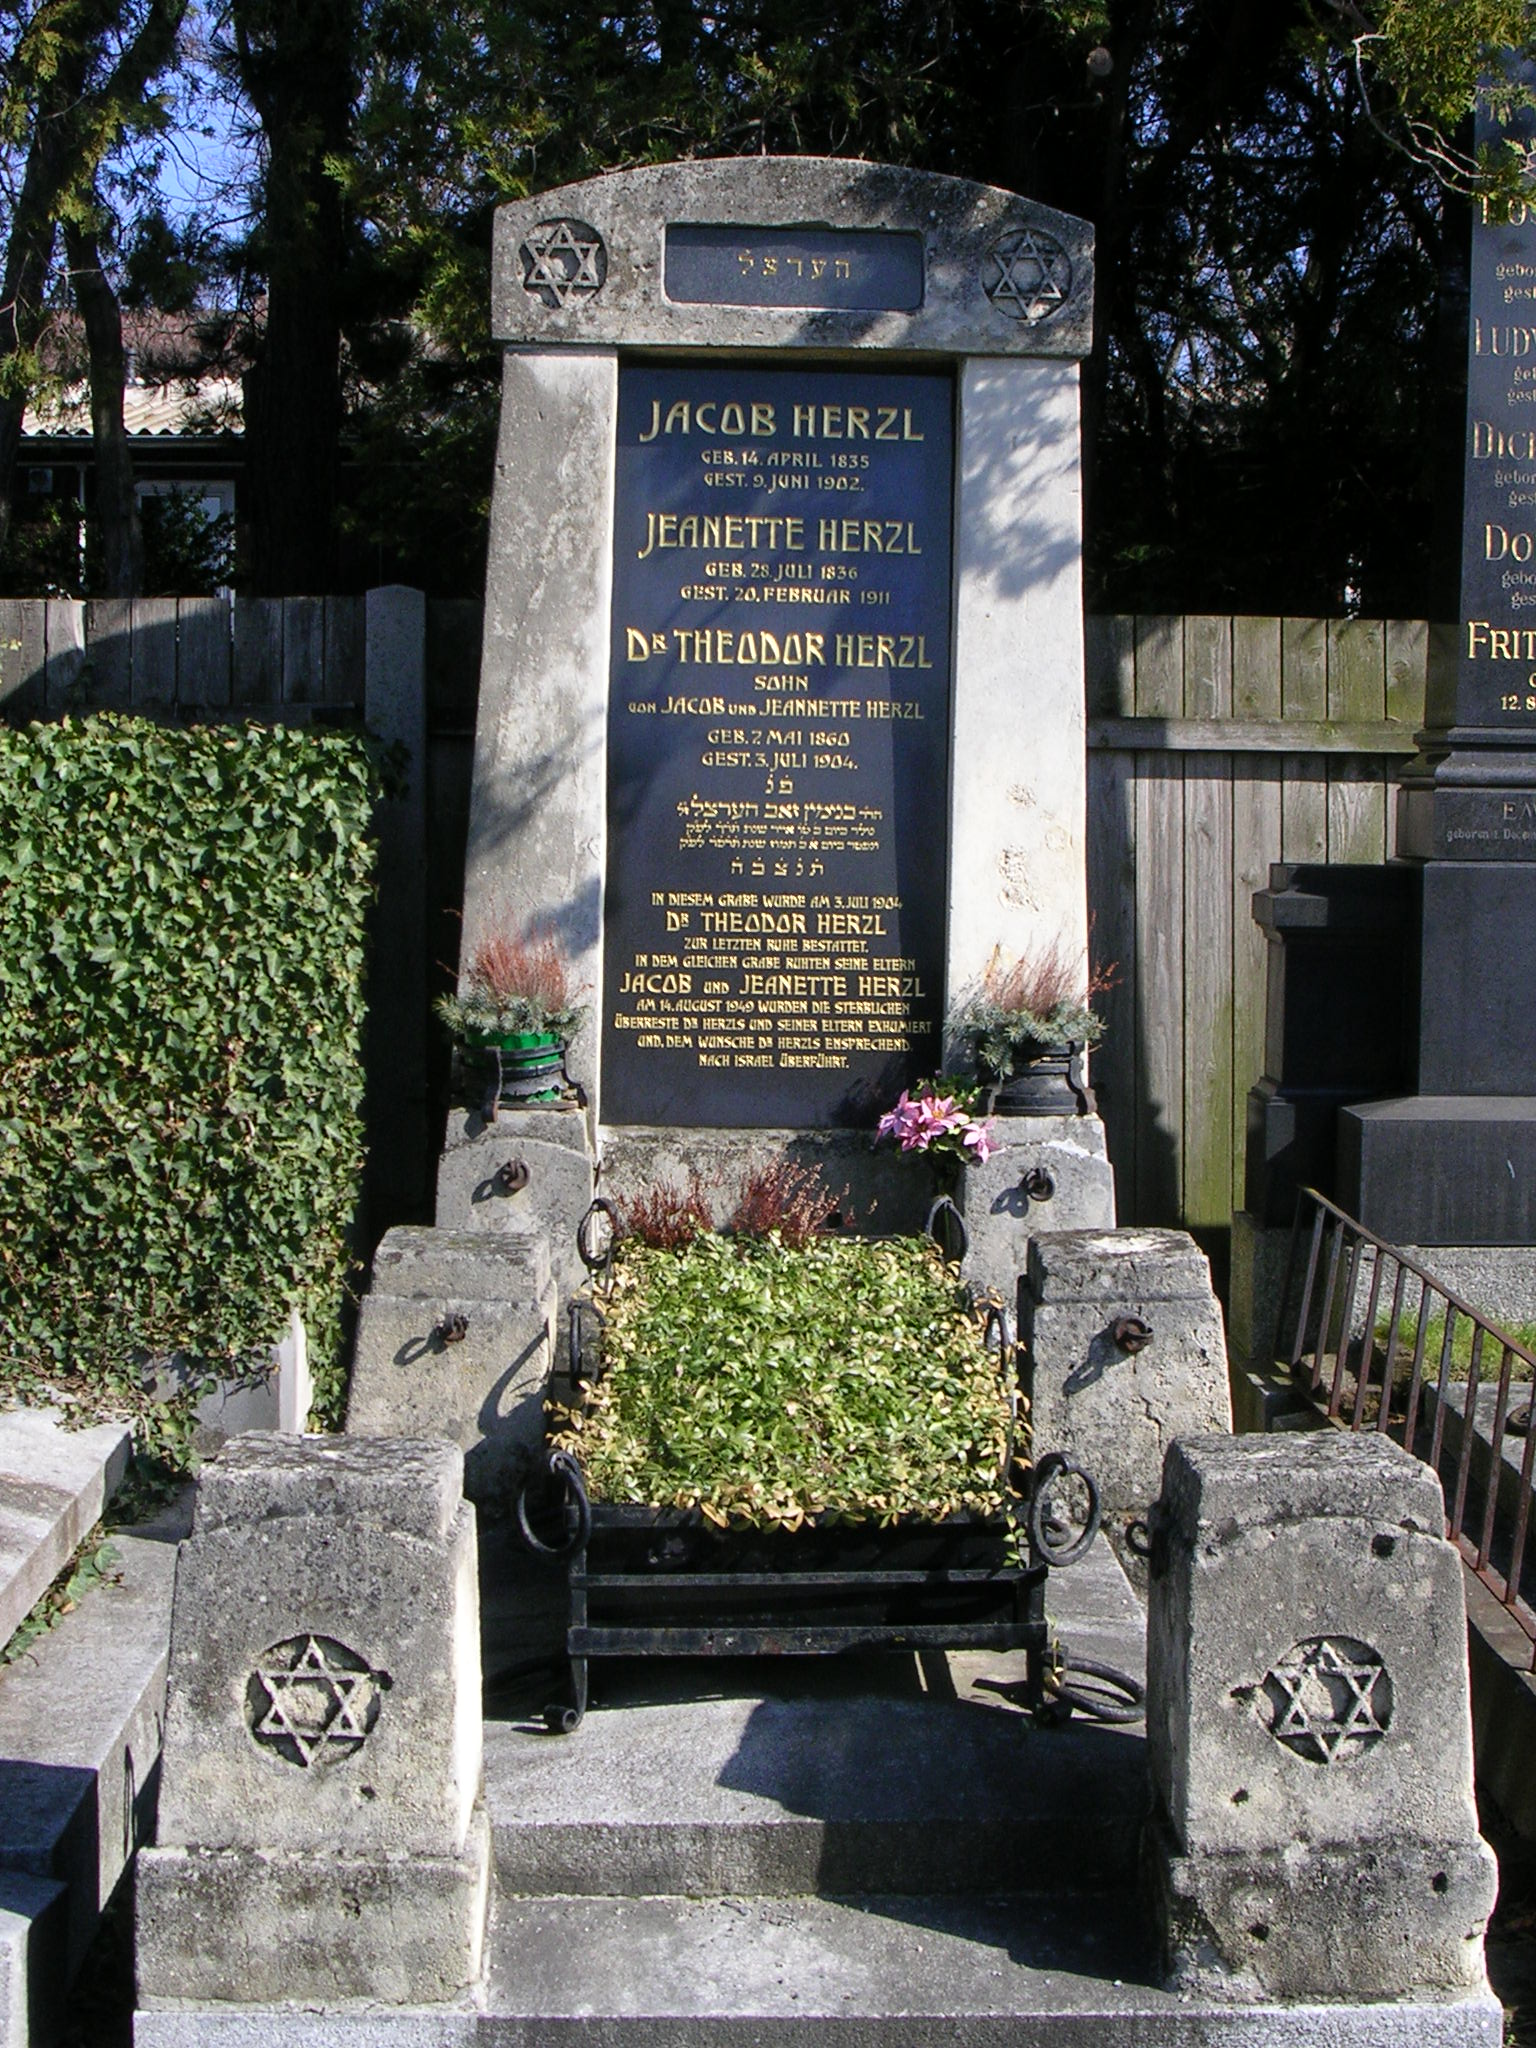 File:Theodor Herzl Grab 20032005.JPG - Wikimedia Commons